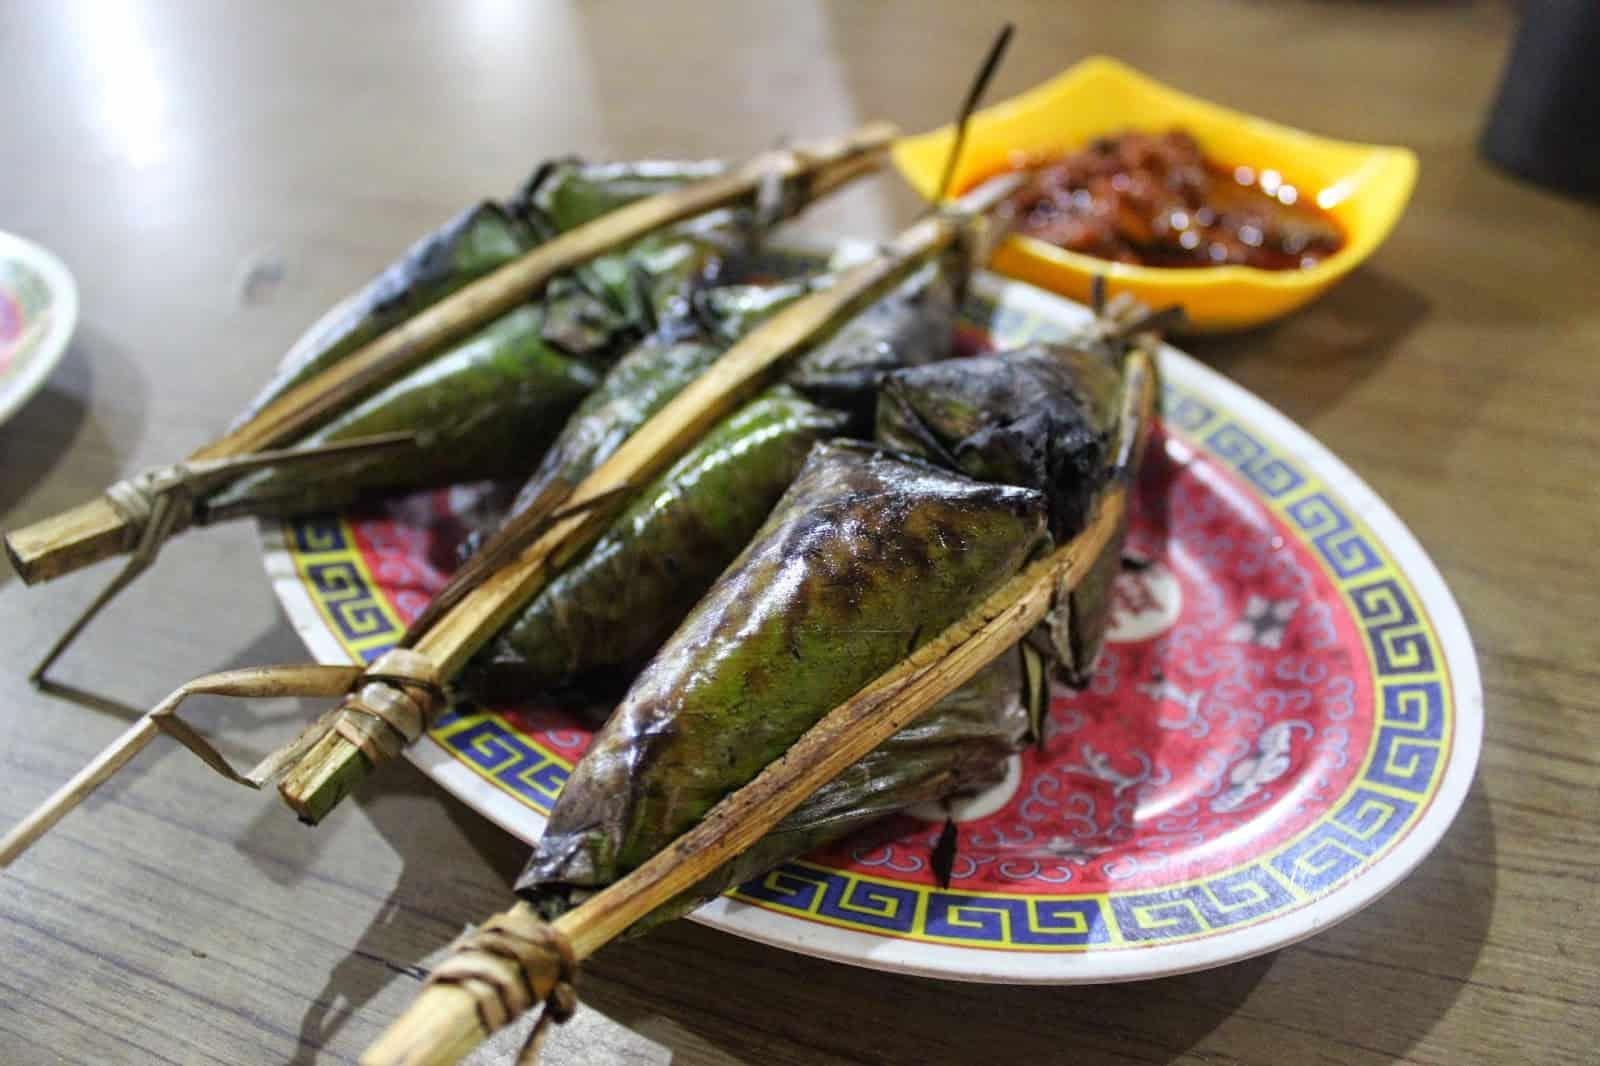 gambar makanan khas kalimantan barat Pengkang